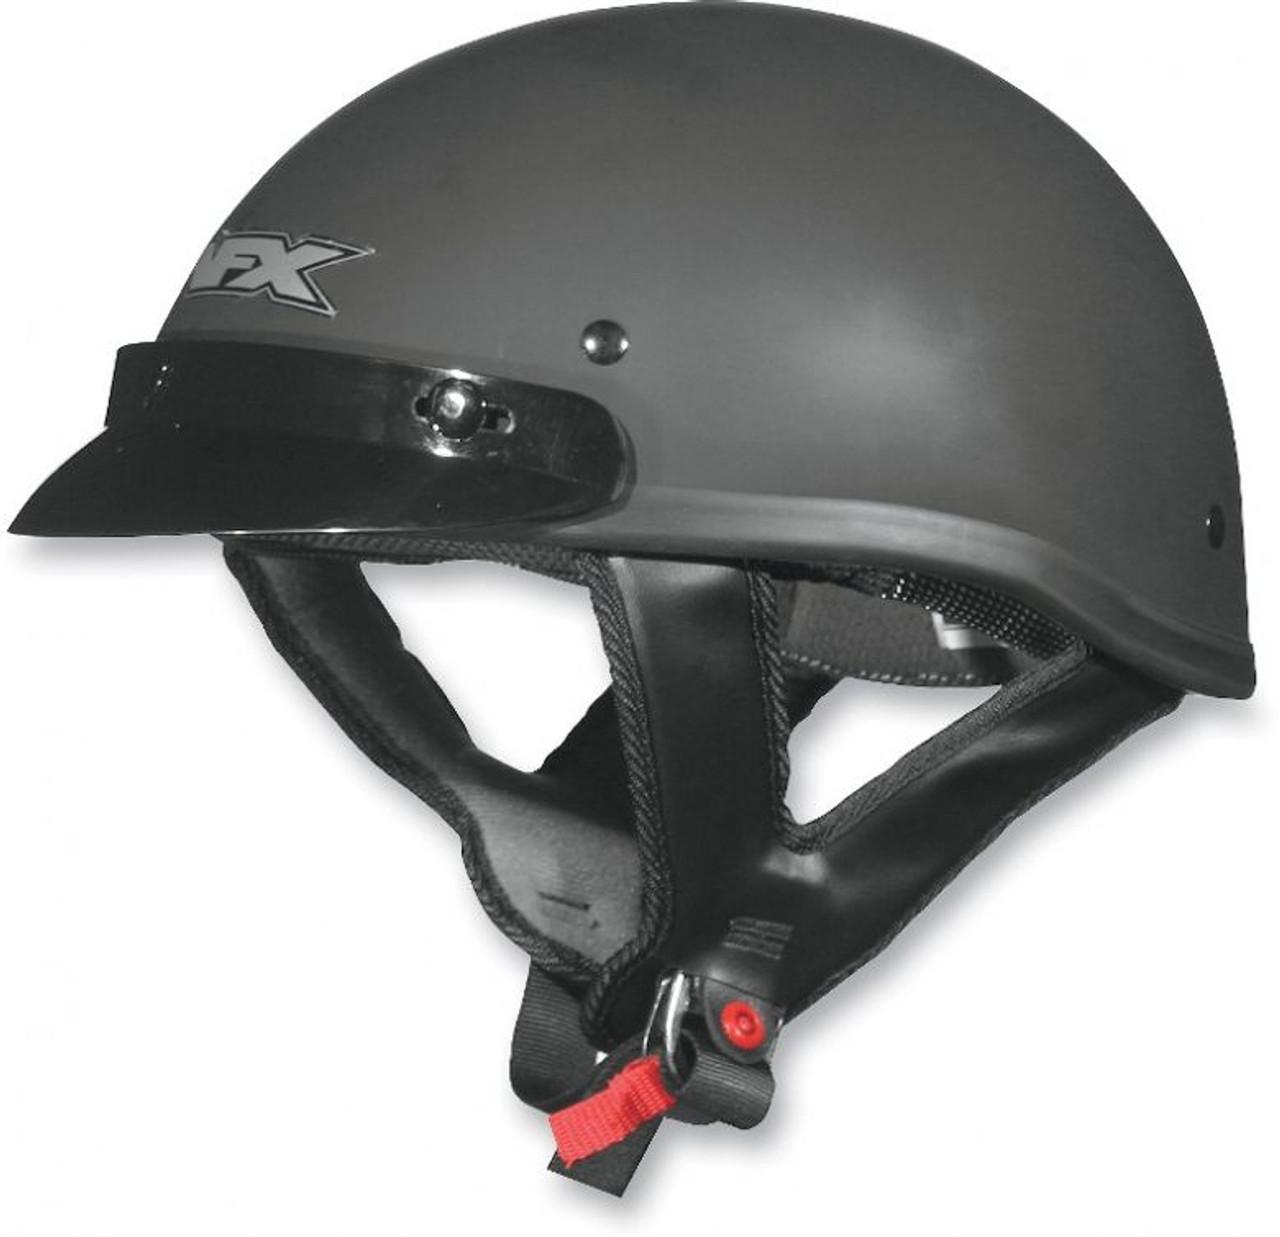 NEW AFX FX-70 Beanie Camouflage Helmet ATV UTV MX SCOOTER